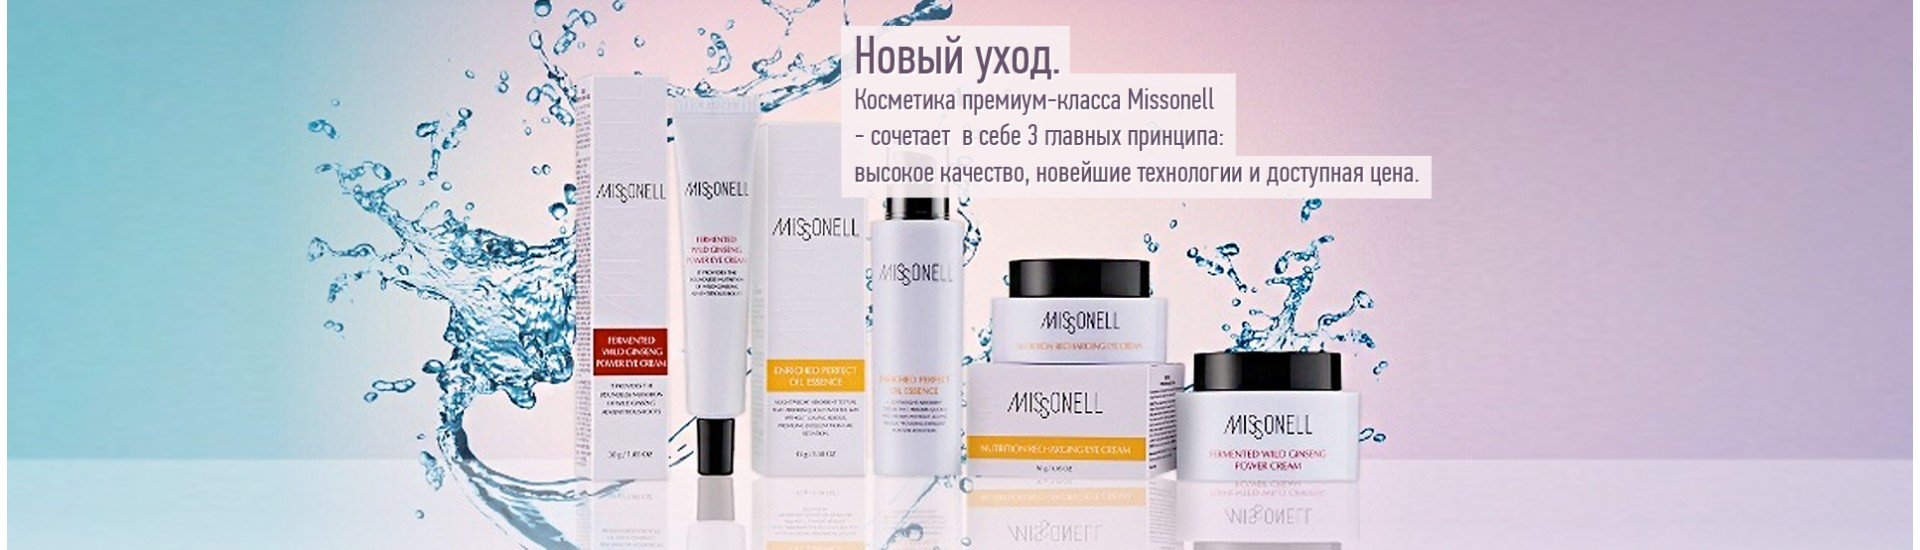 Kosmetika 2